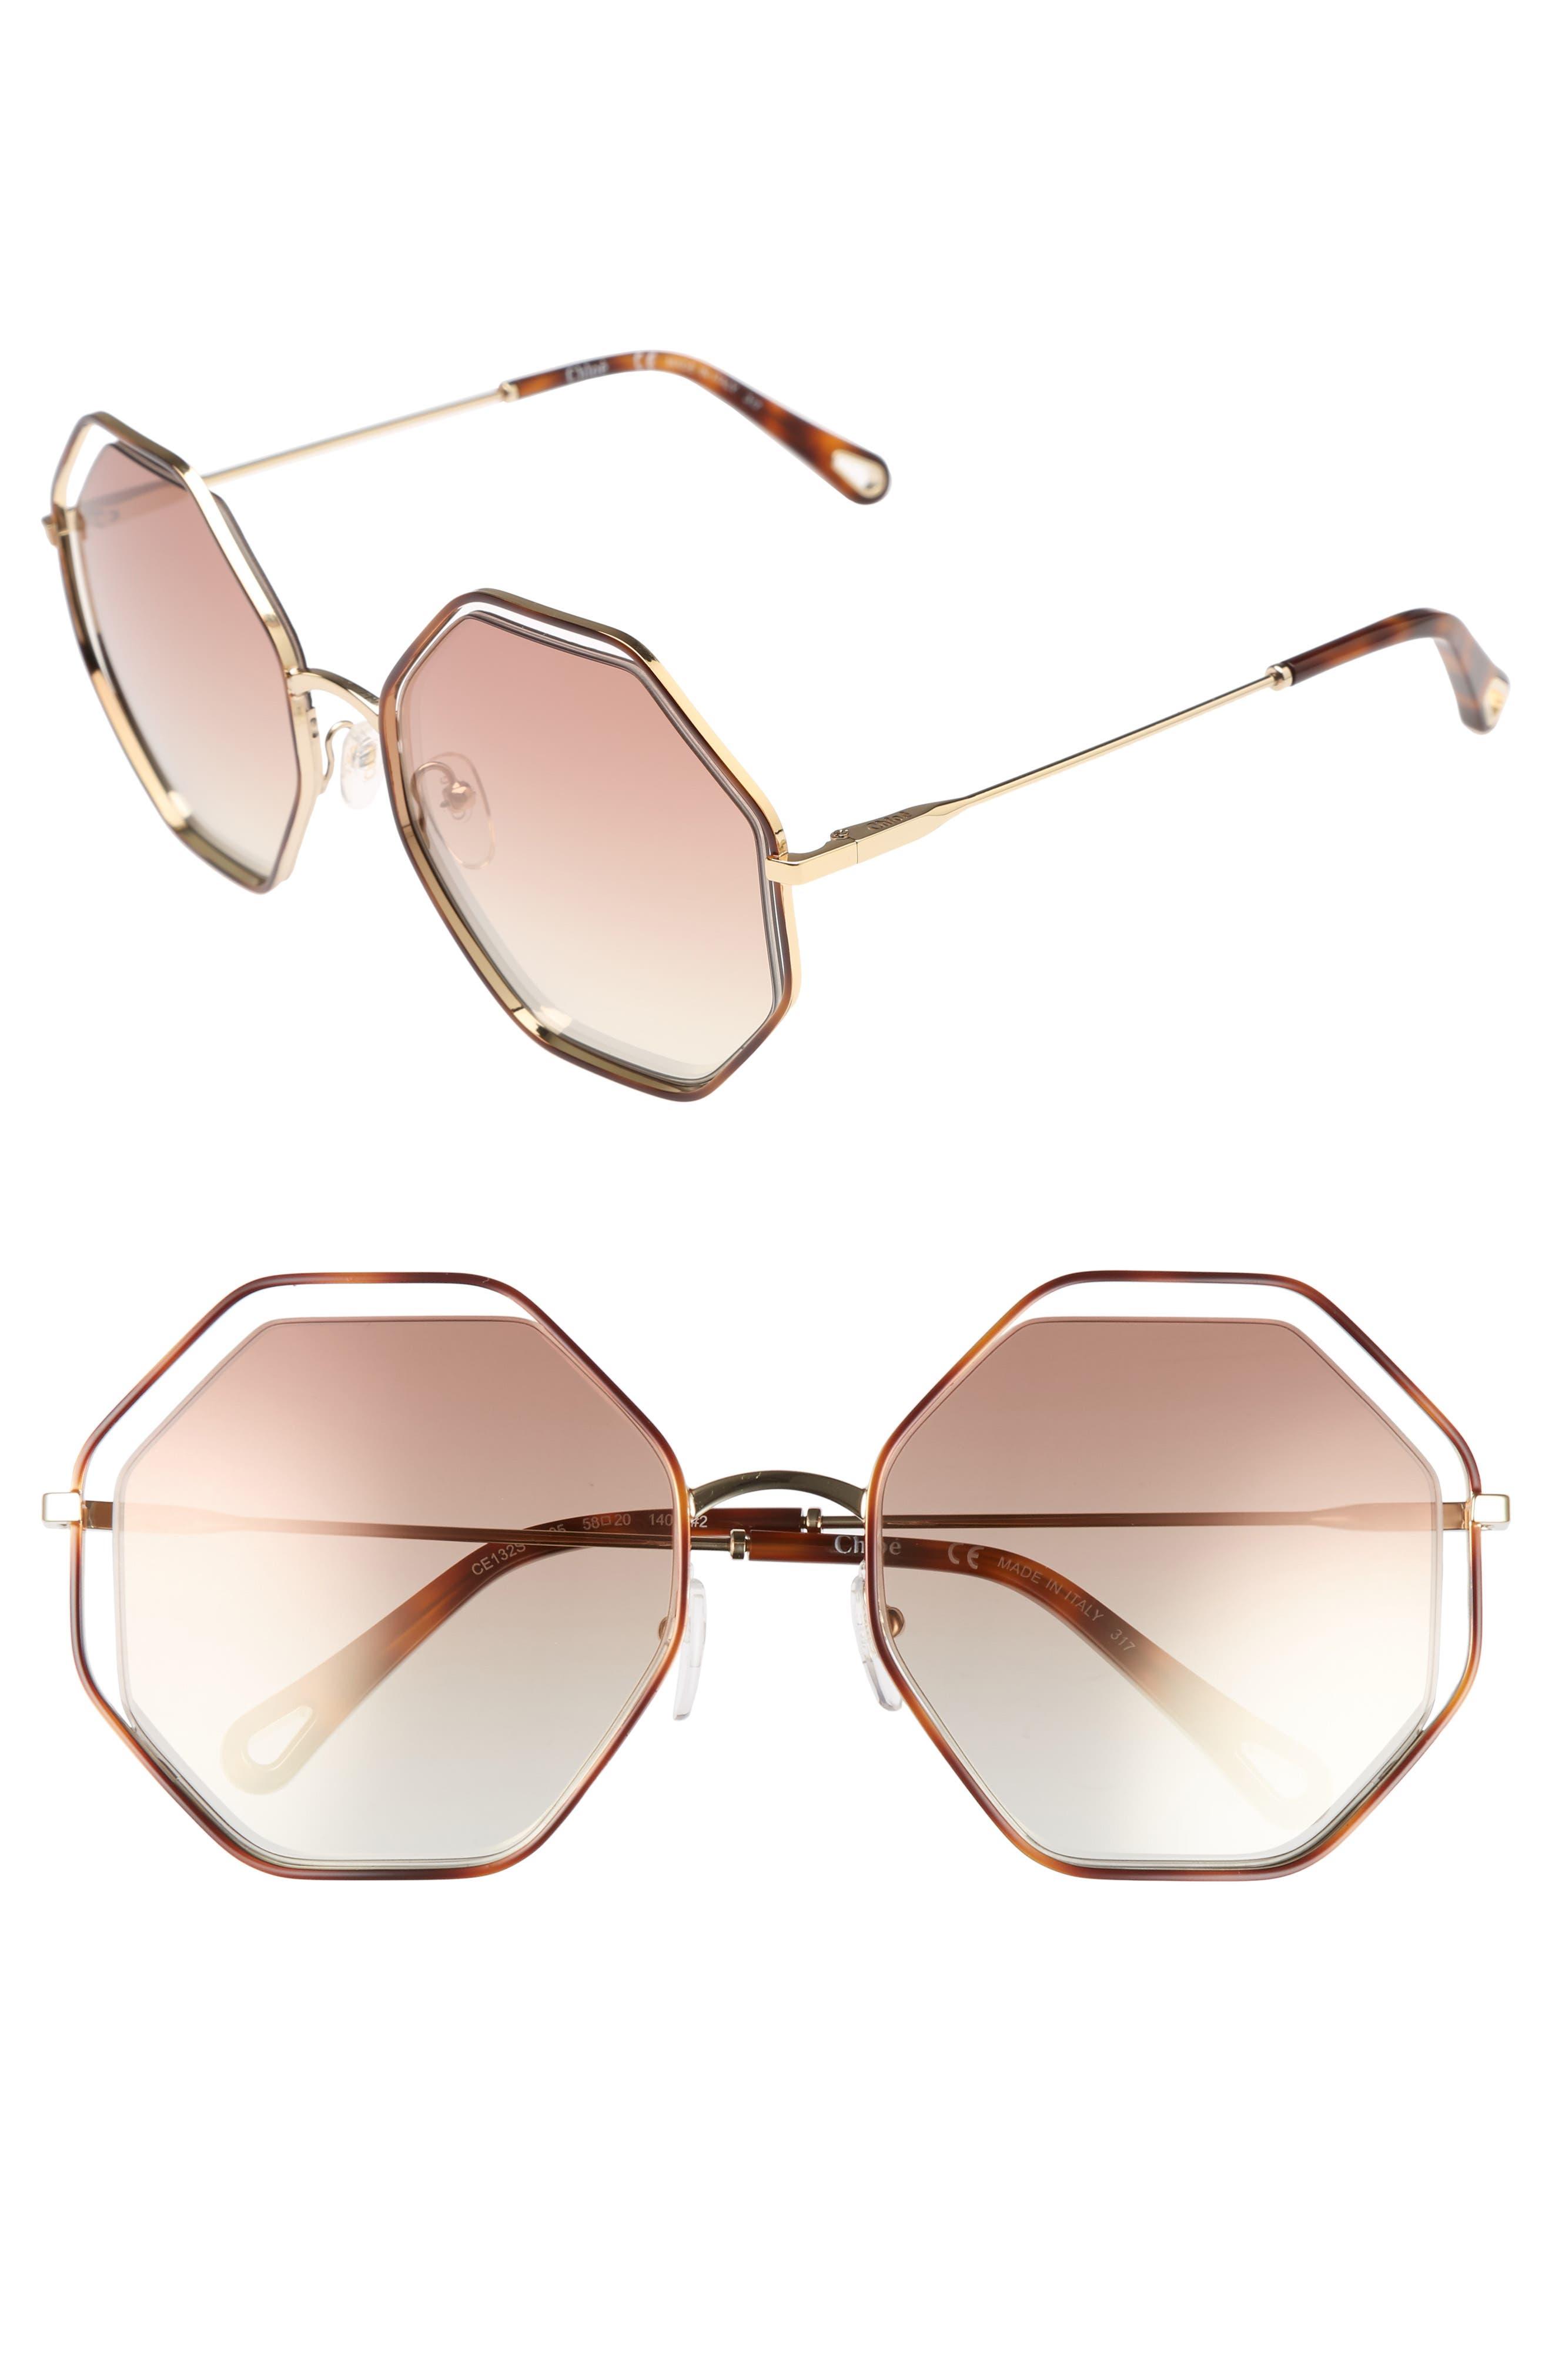 58mm Octagonal Halo Lens Sunglasses,                             Main thumbnail 1, color,                             HAVANA/ BRONZE